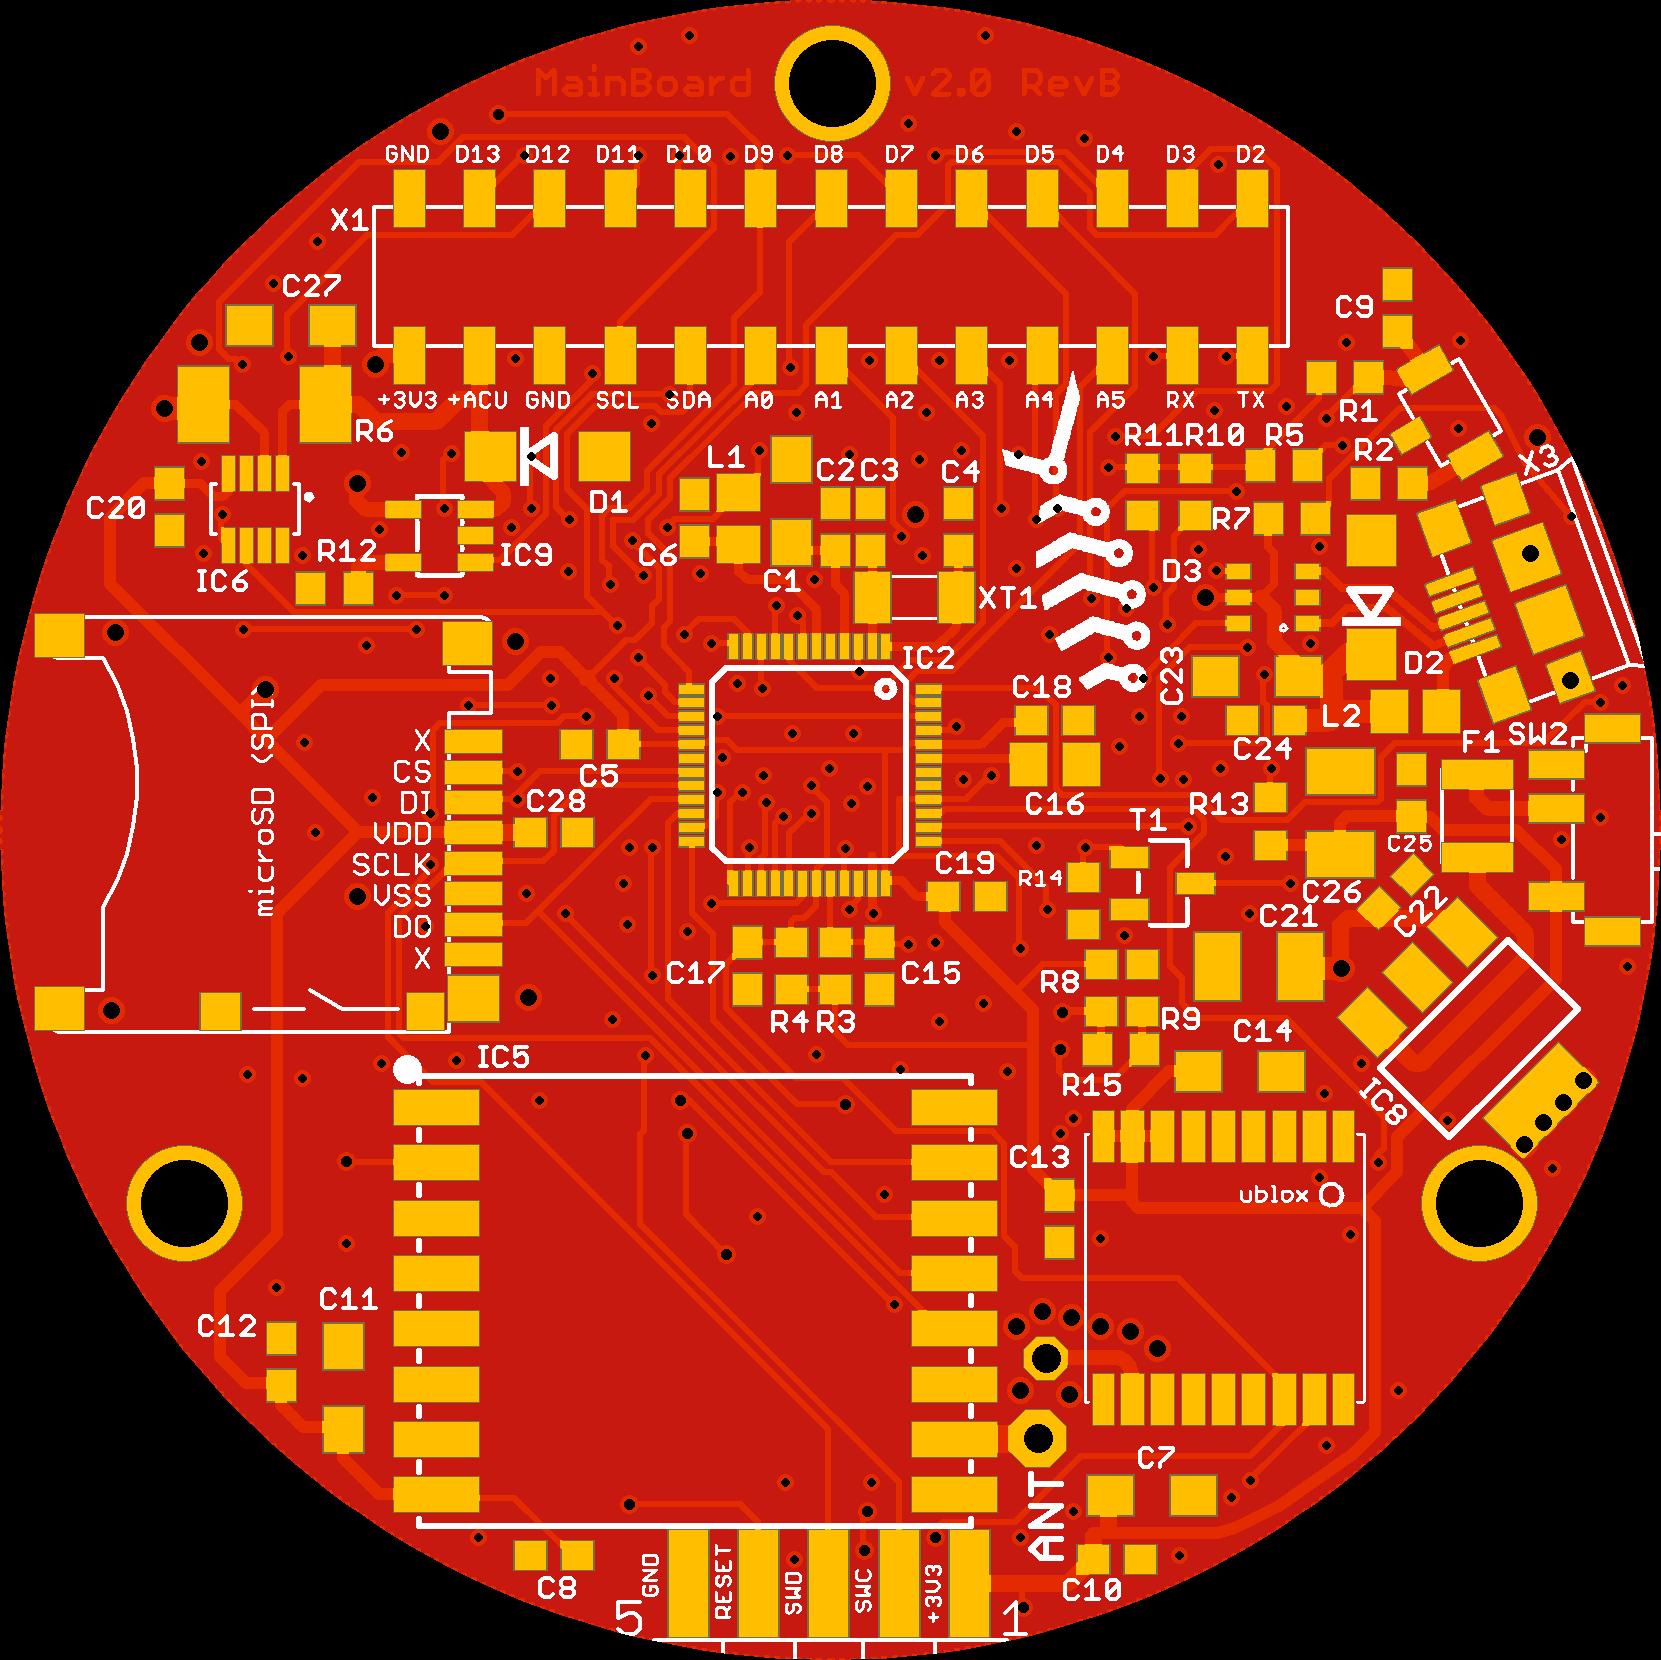 Boards/MainBoard_v2.0_RevB/PNGview/BOT_revB.png